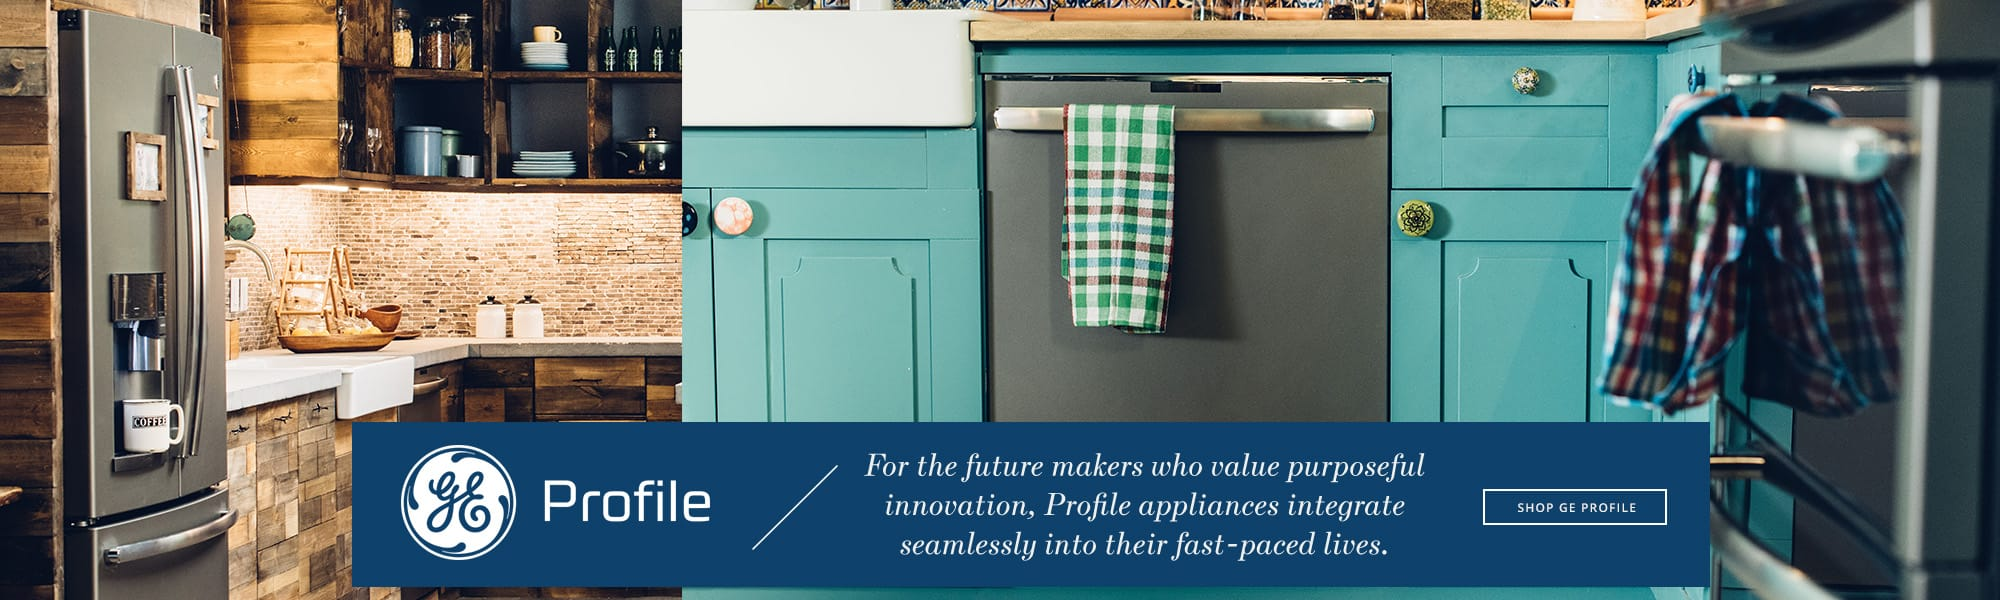 GE Profile appliances